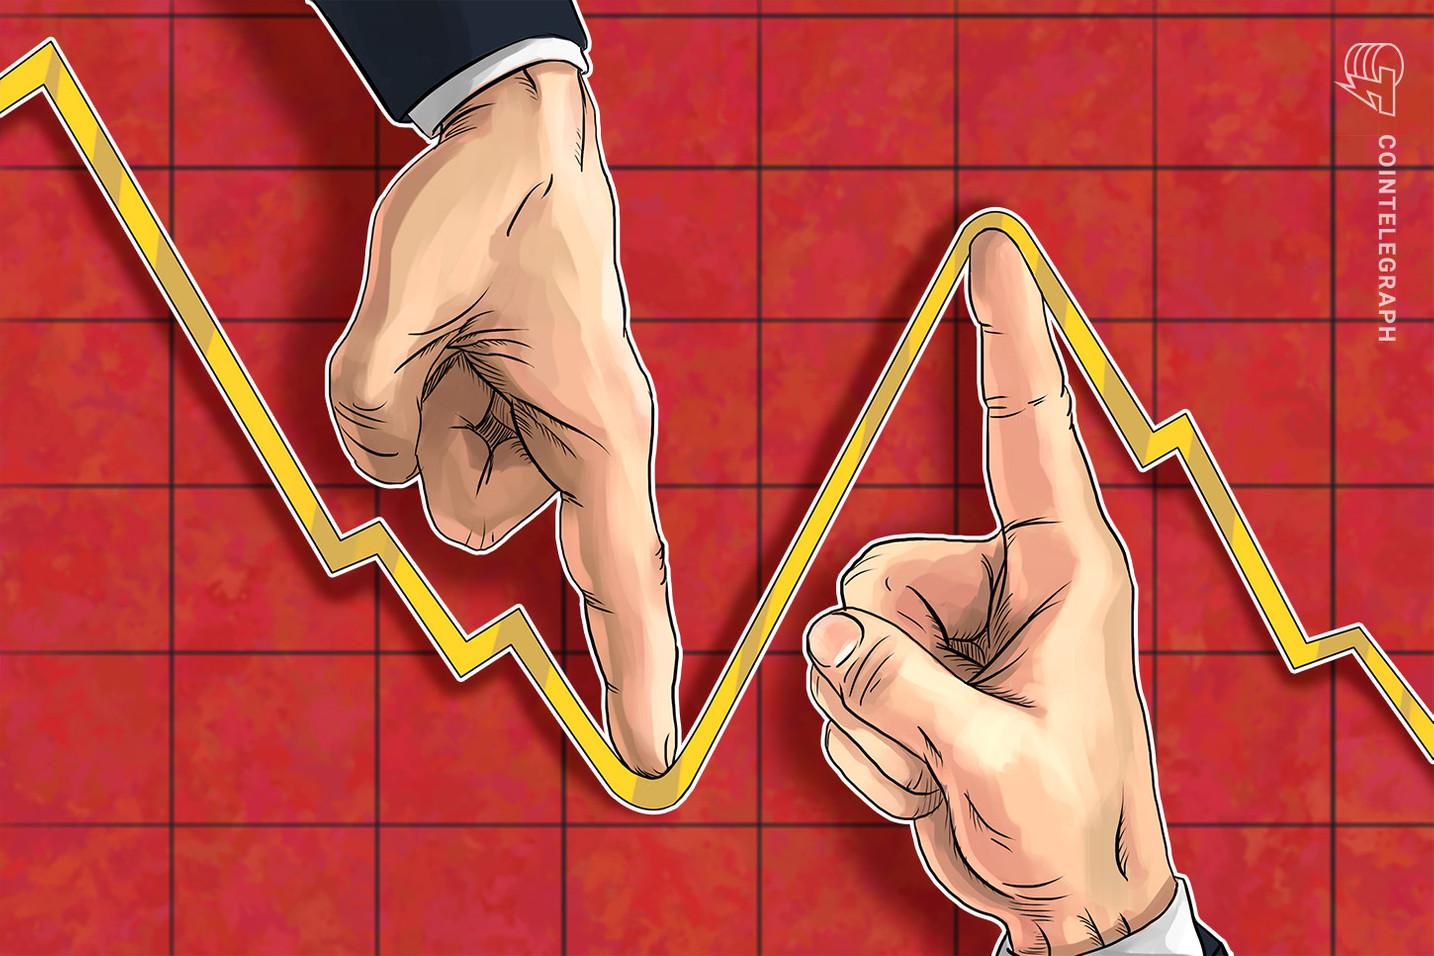 Crypto Markets See Ongoing Mild Losses, Bitcoin Trades Below $6,400